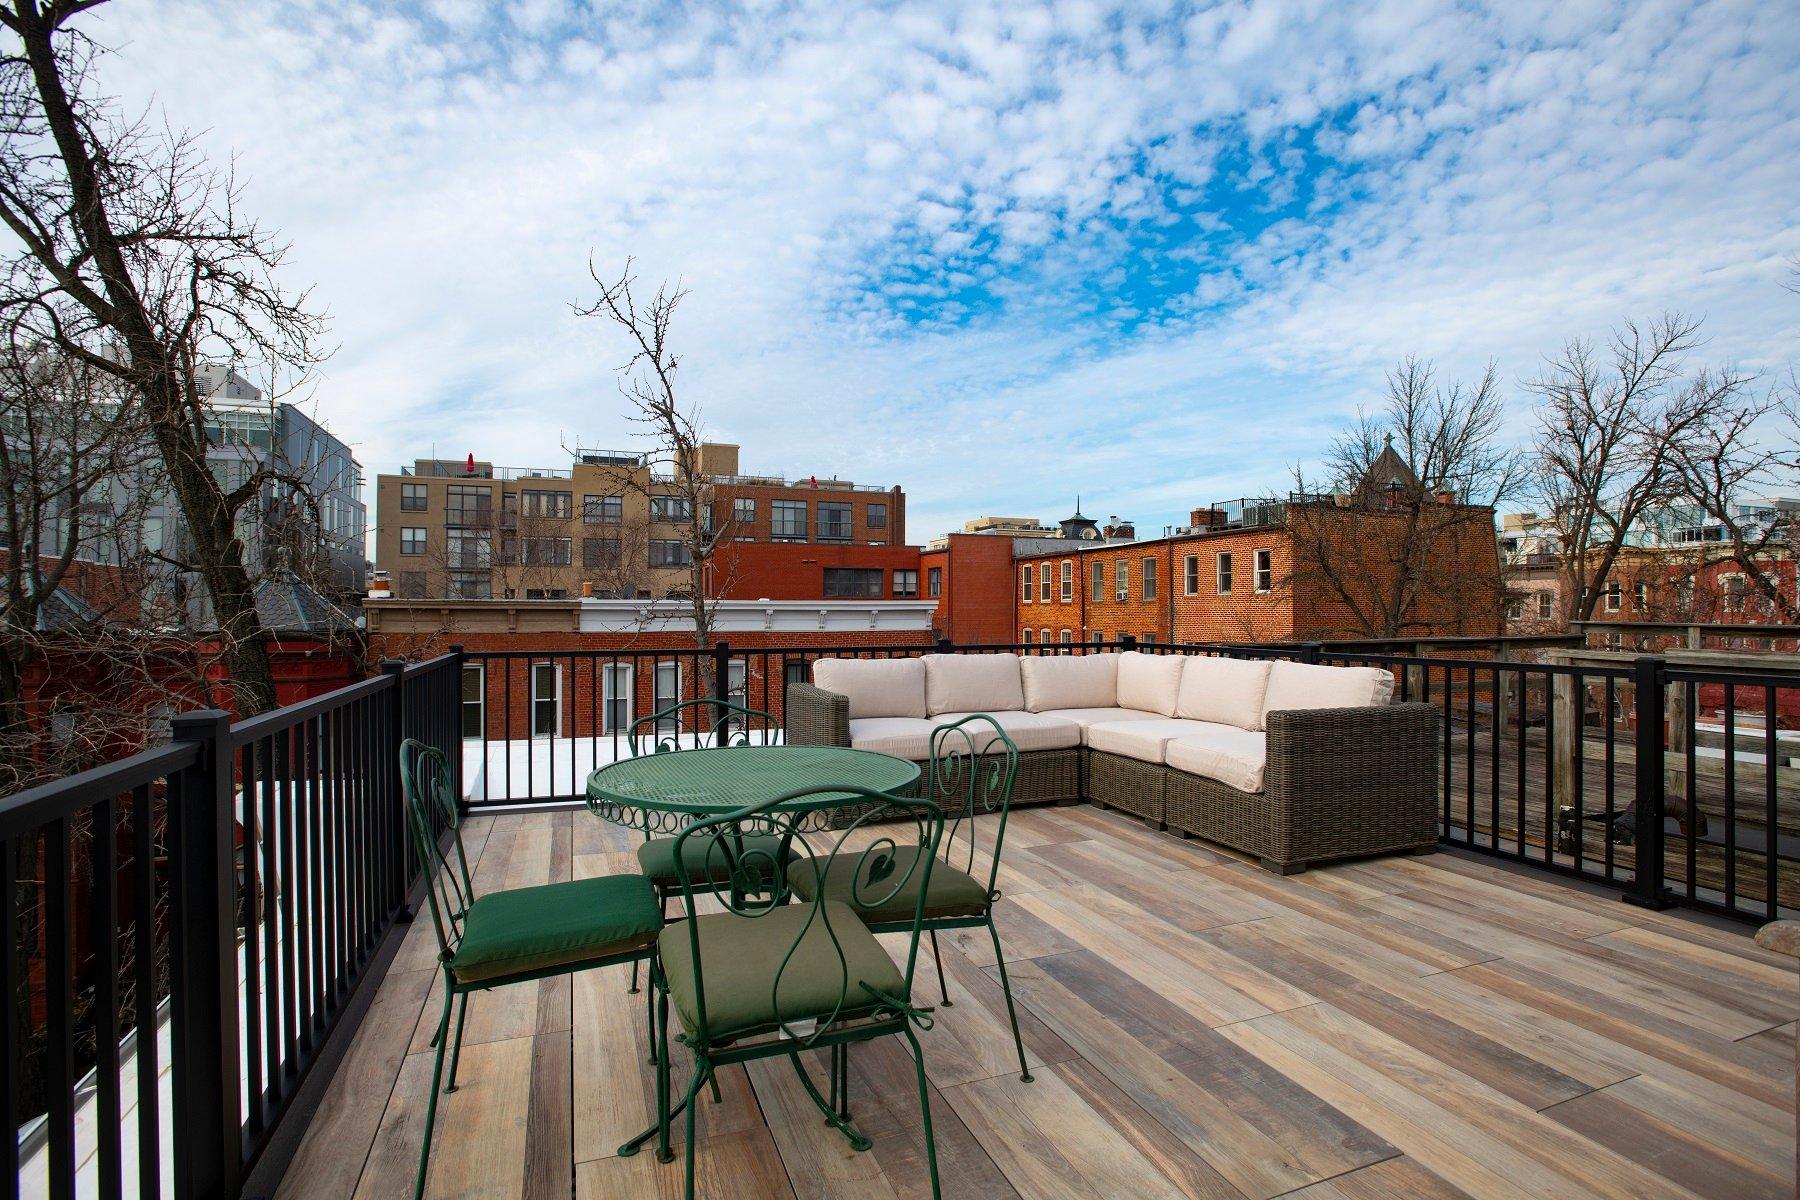 logans-circle-rooftop-deck-with-archatrak-deck-tiles (7)